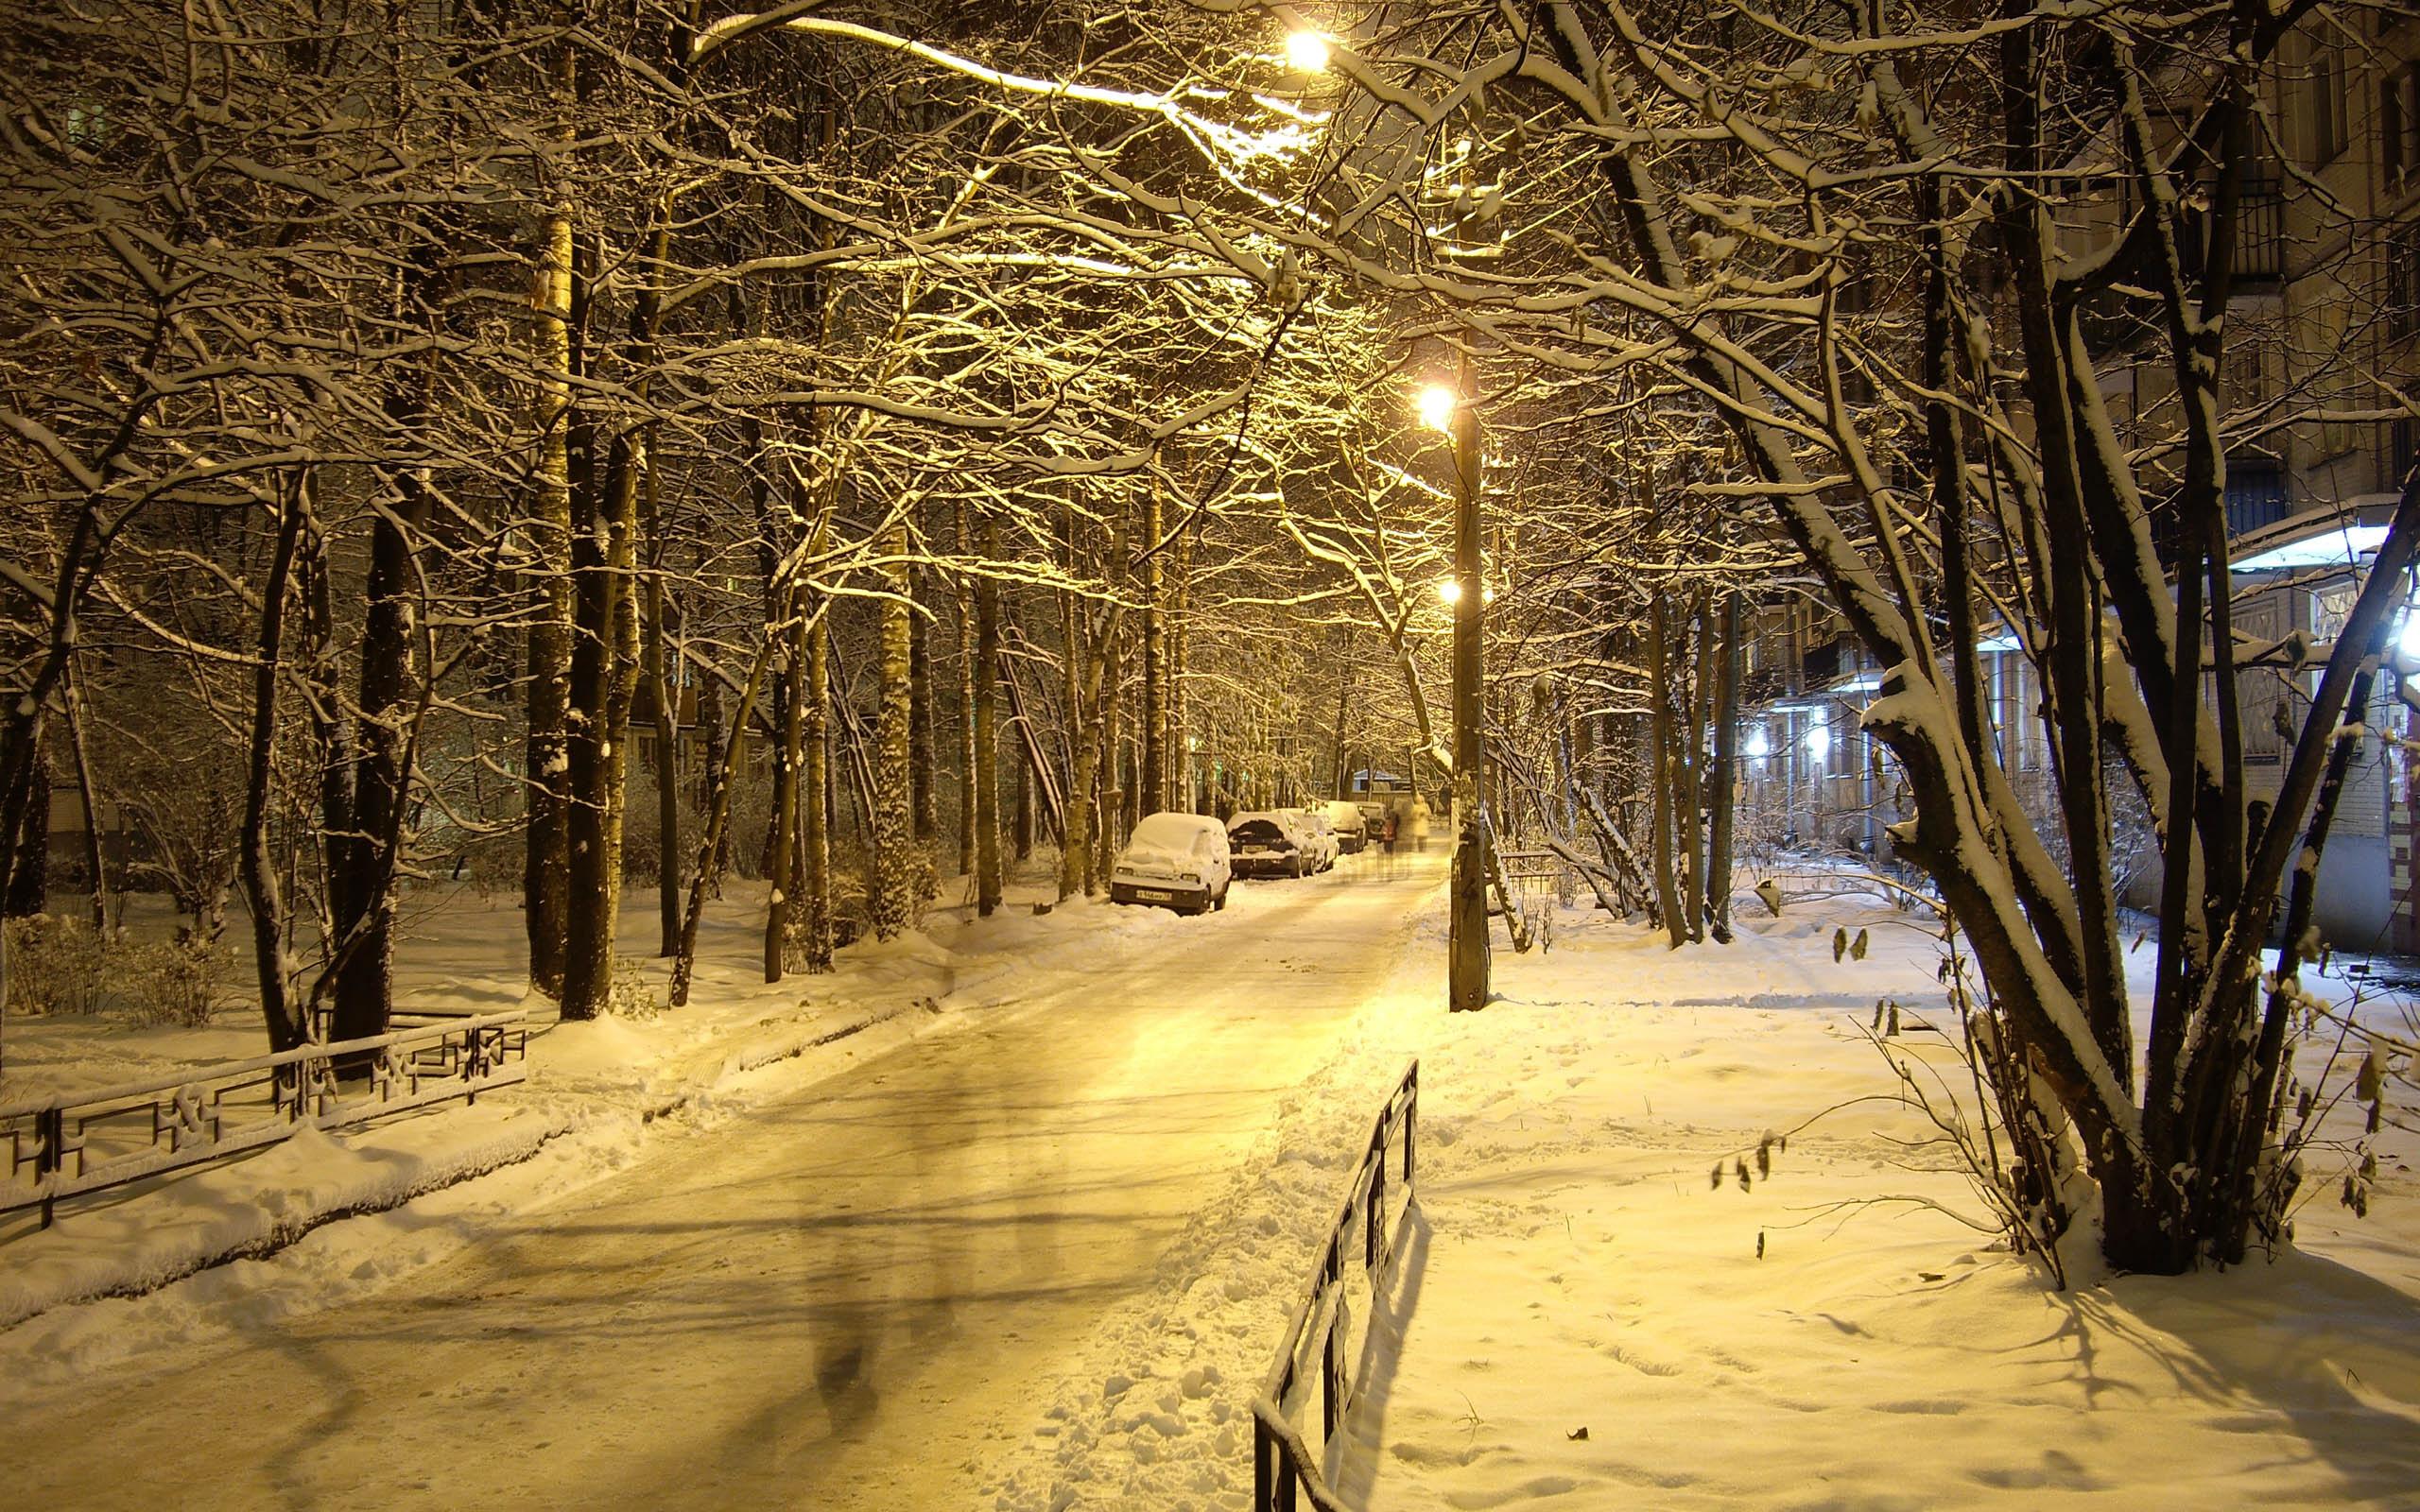 Beautiful Winter Night Places Hq Wallpapers 18 68338 HD Wallpaper 2560x1600